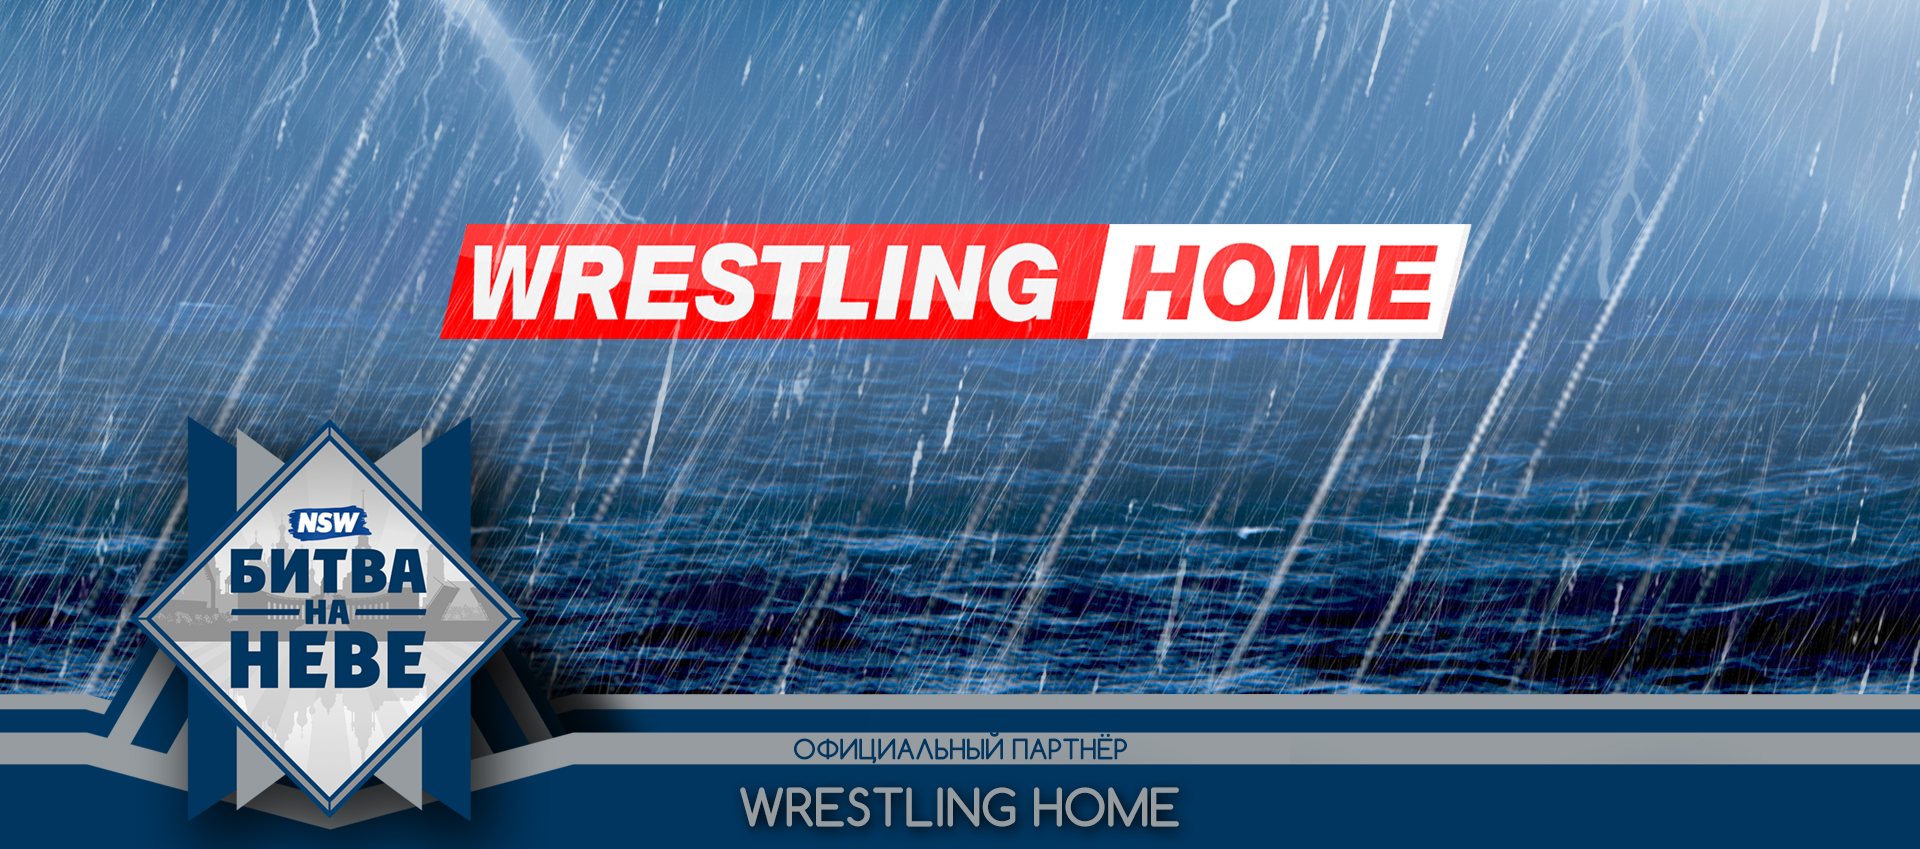 NSW Битва На Неве: Партнёр - Сообщество Wrestling Home